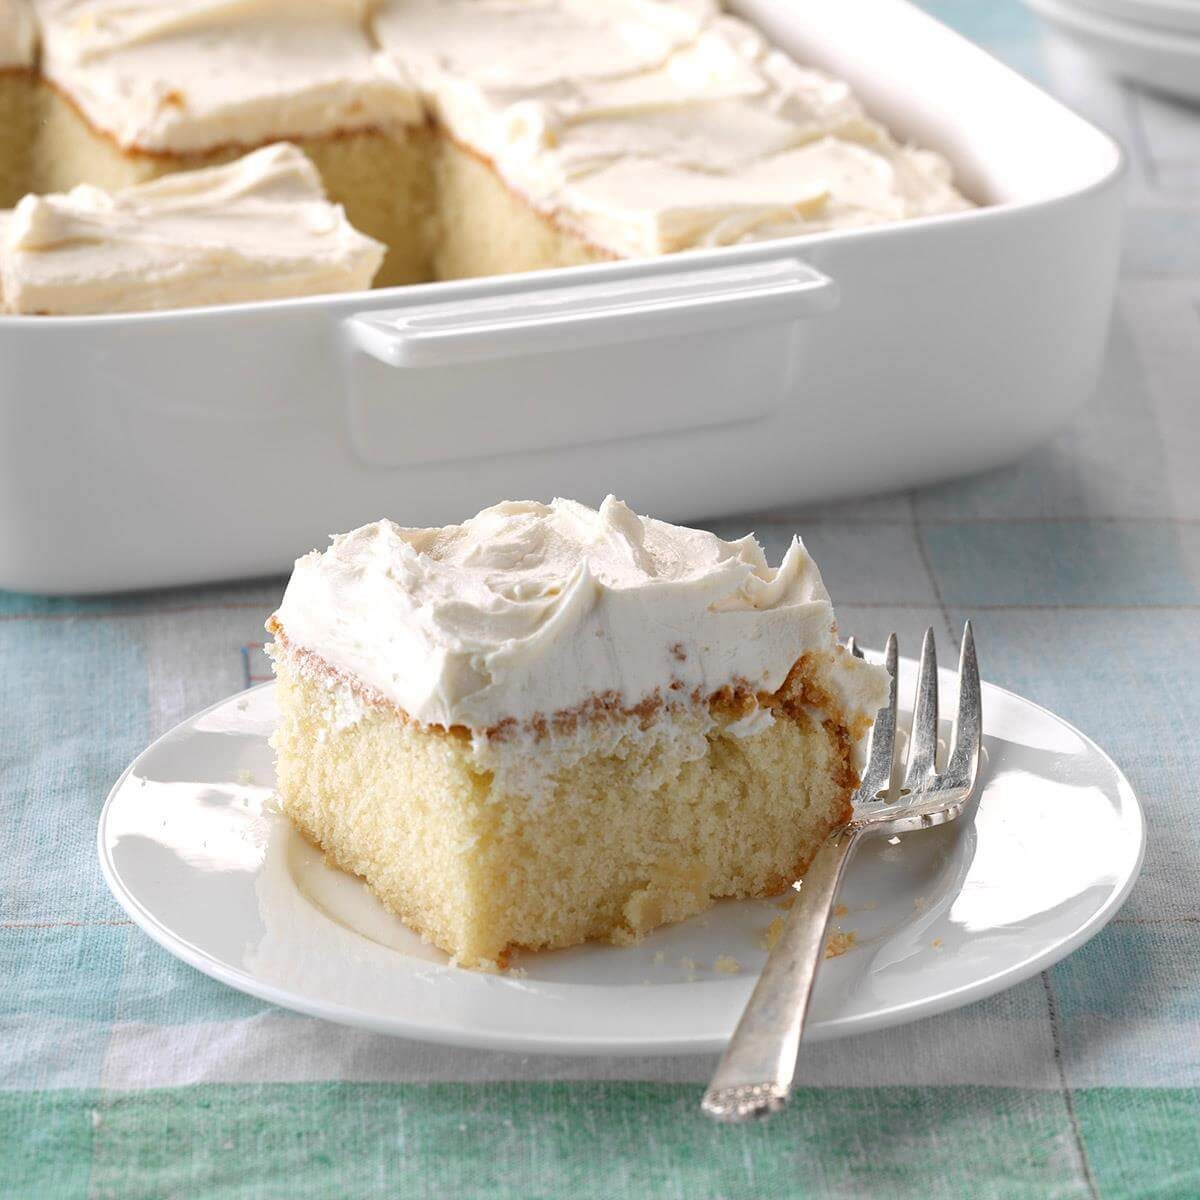 24 Favorite Graduation Cake Ideas Taste Of Home